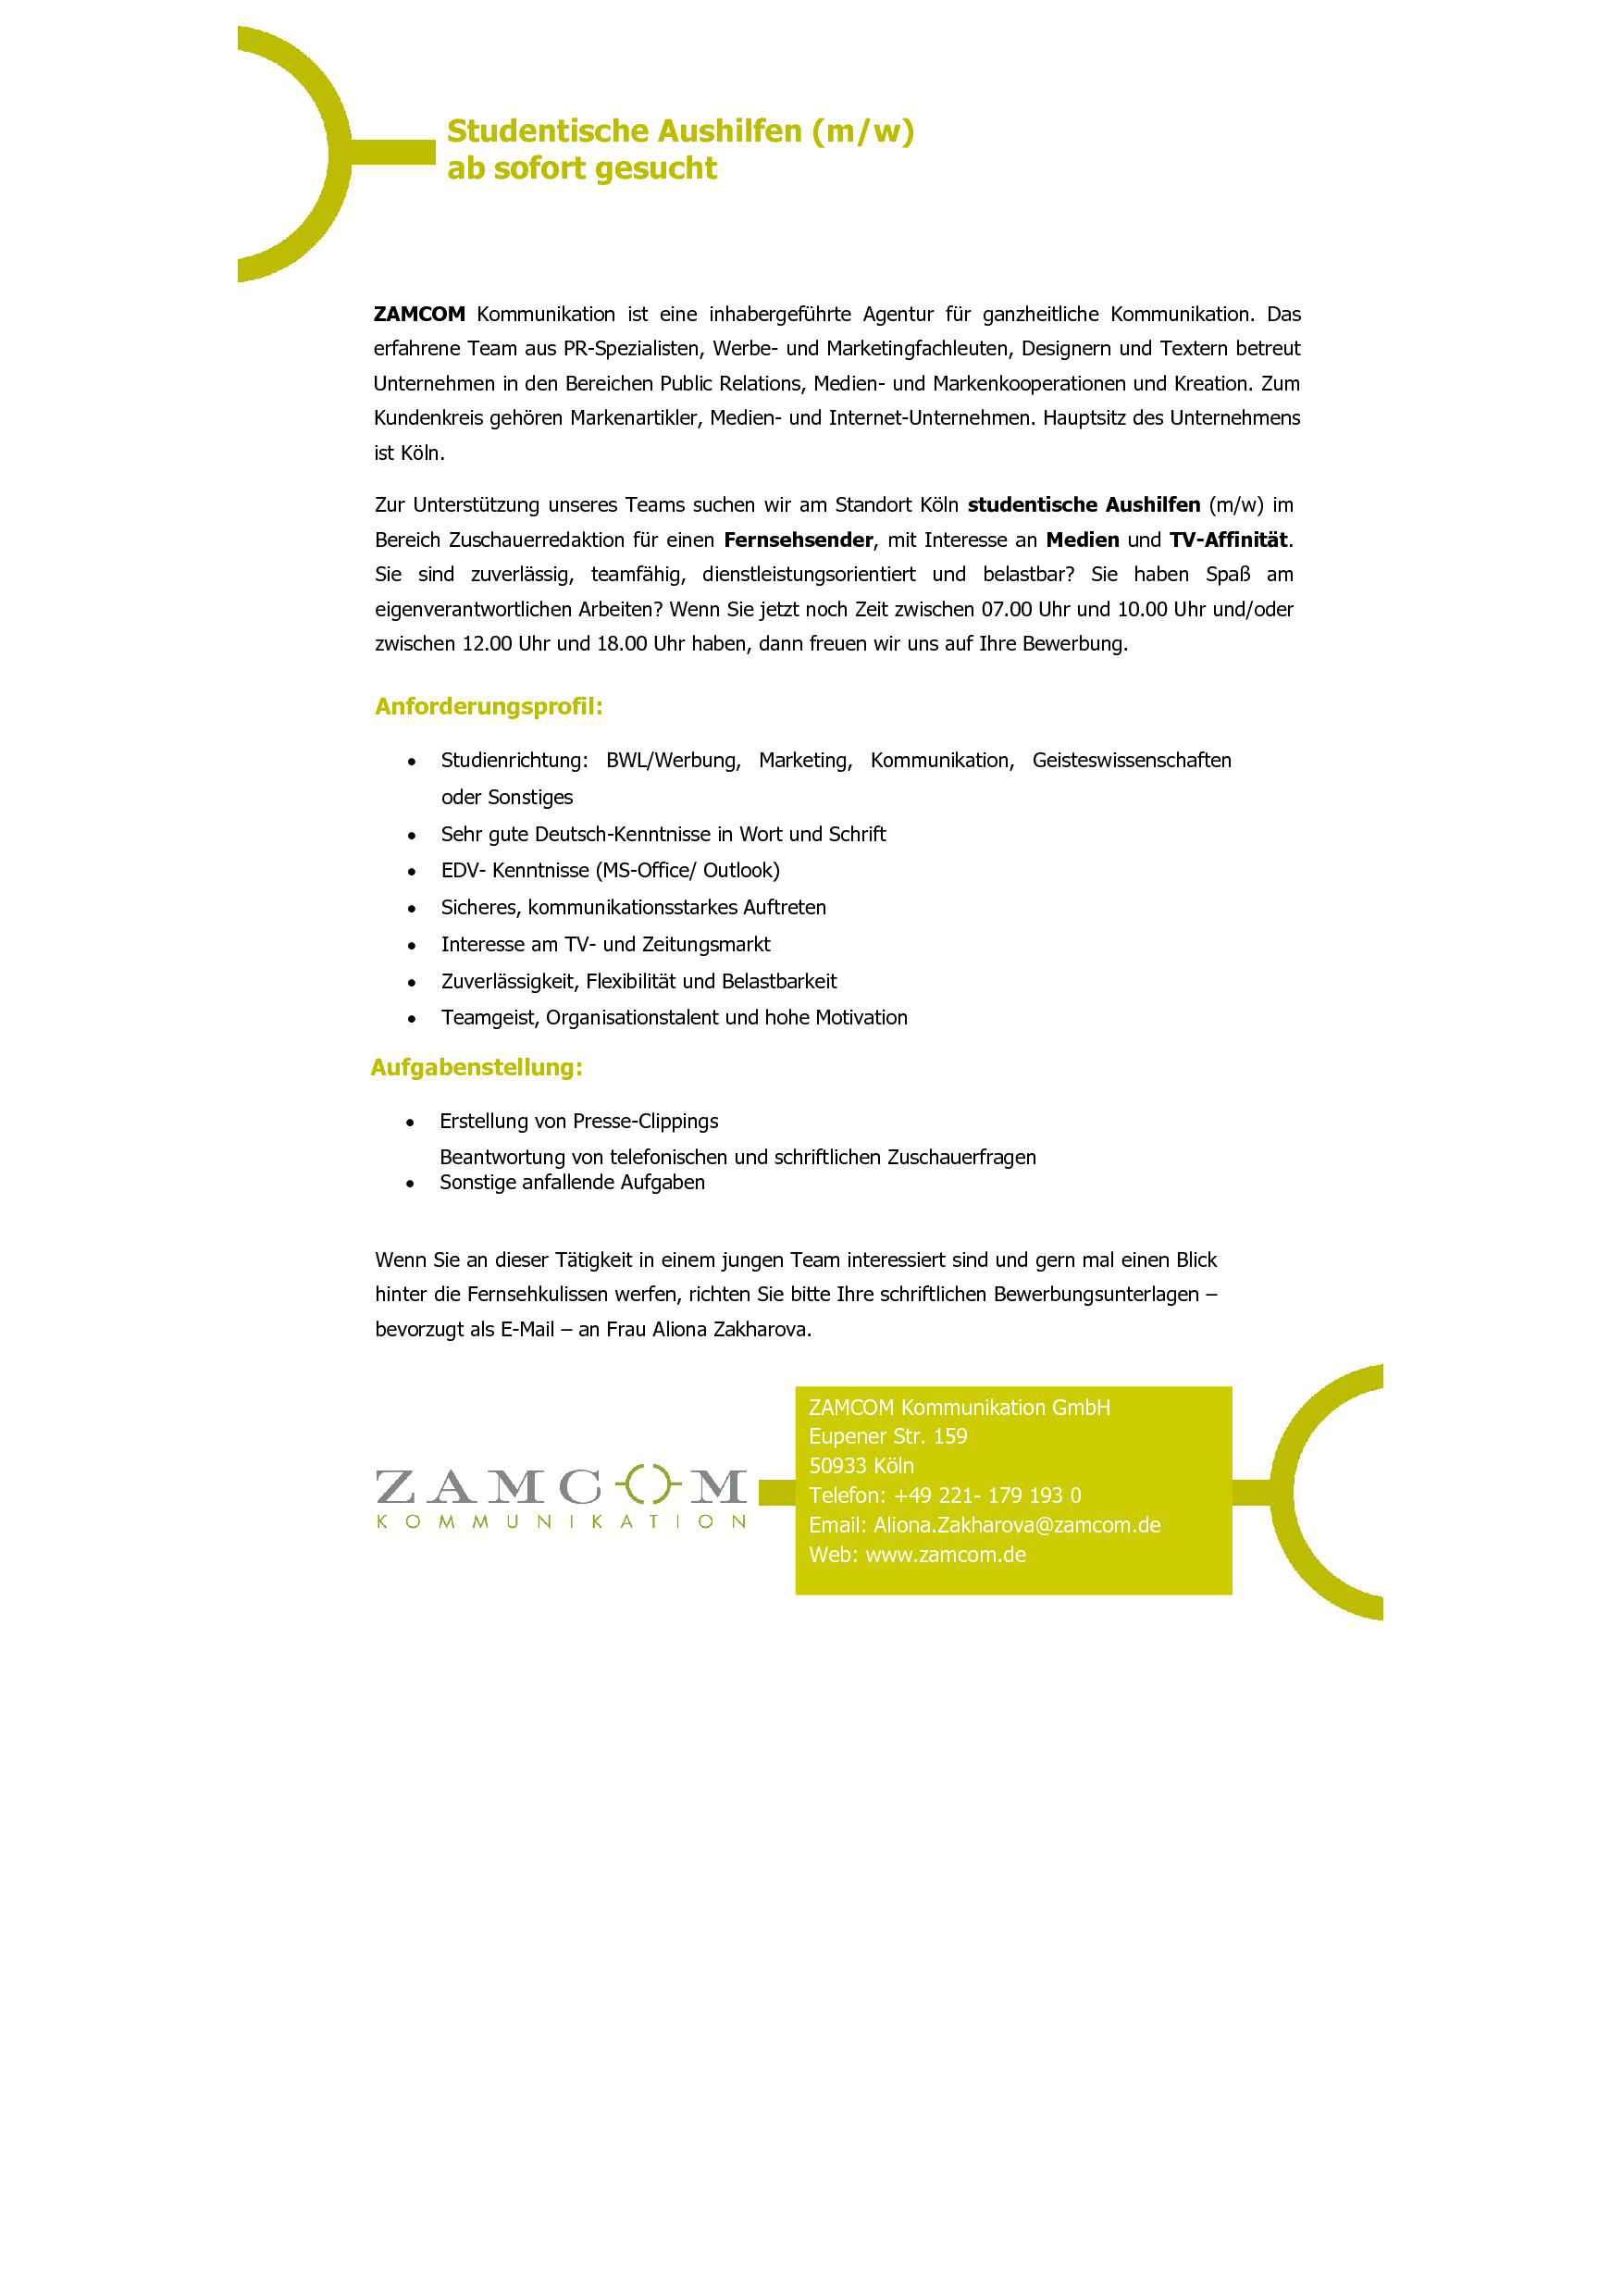 Aushang_Studentische_Aushilfe_AZ-1-1